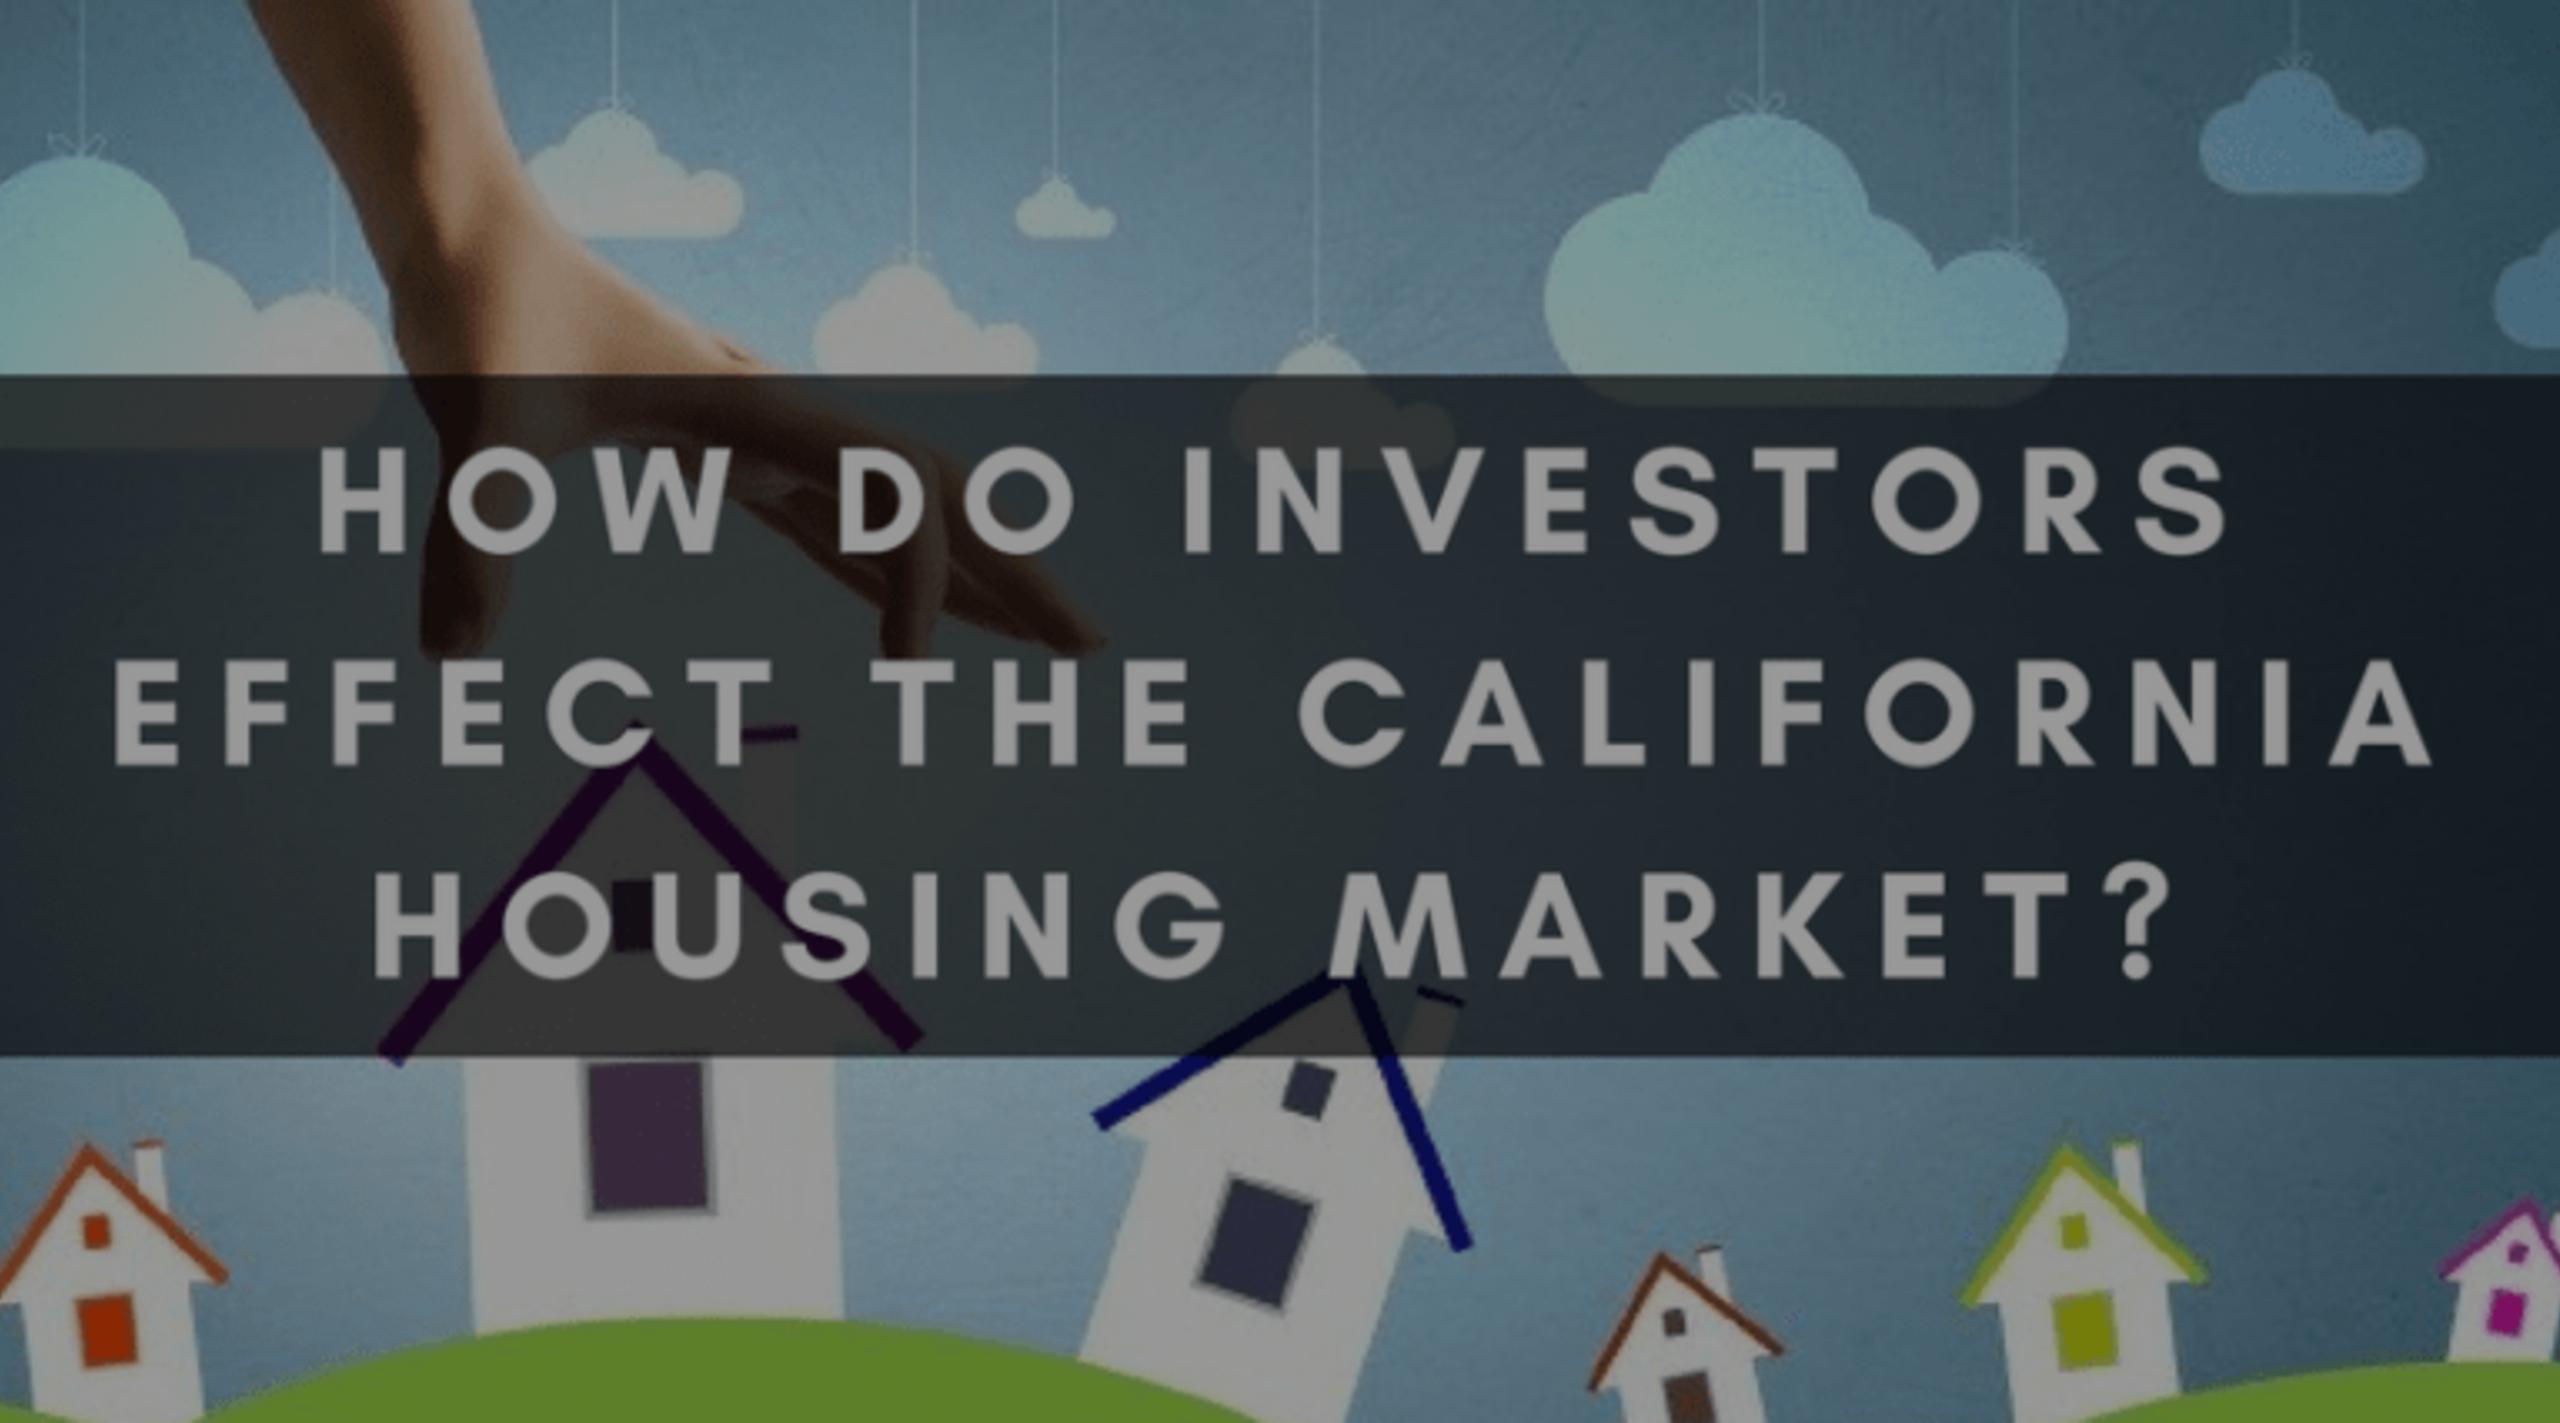 HOW DO INVESTORS EFFECT THE CALIFORNIA HOUSING MARKET?